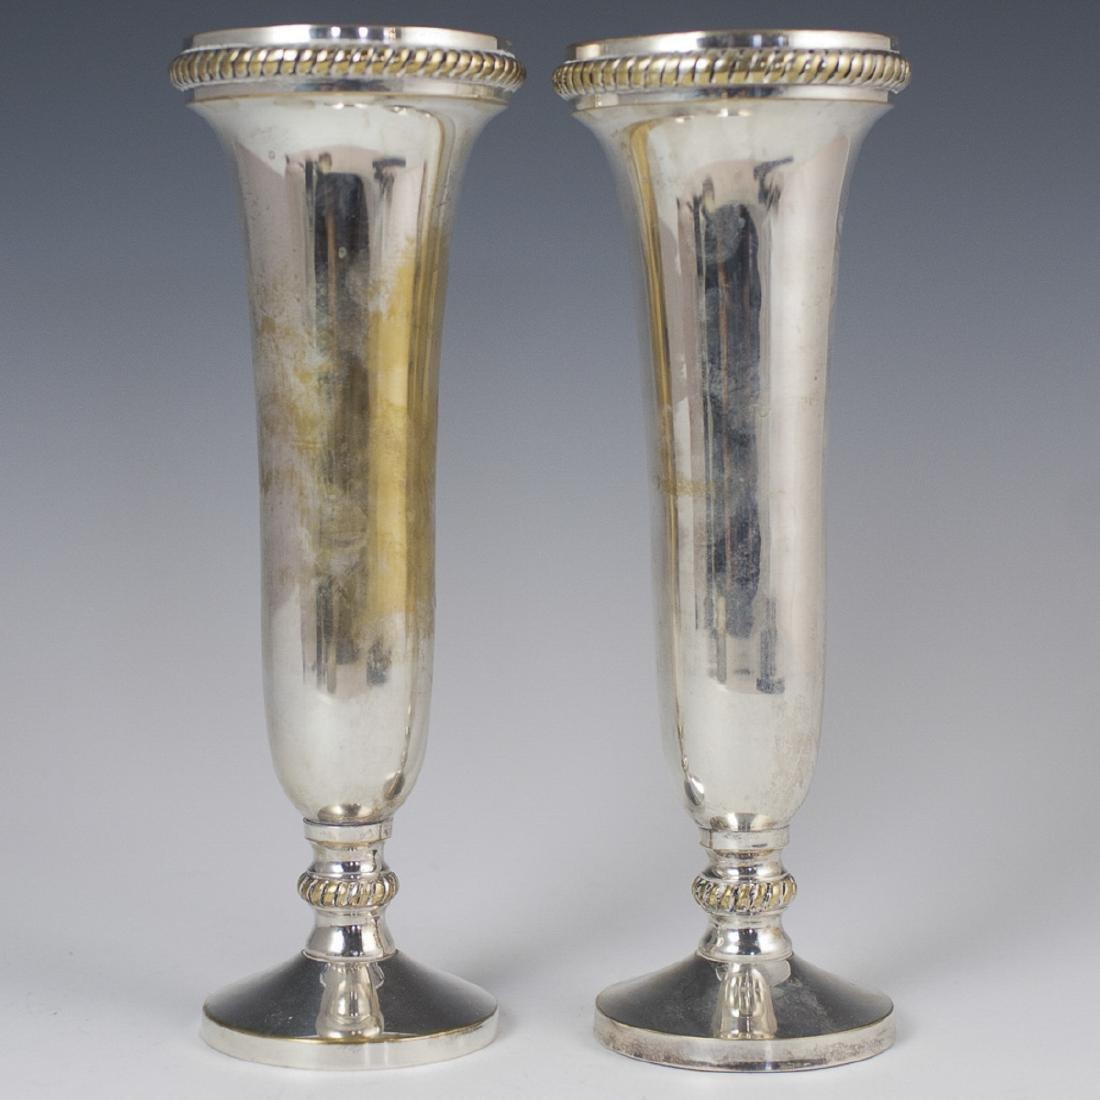 Vintage Silver Plated Vases